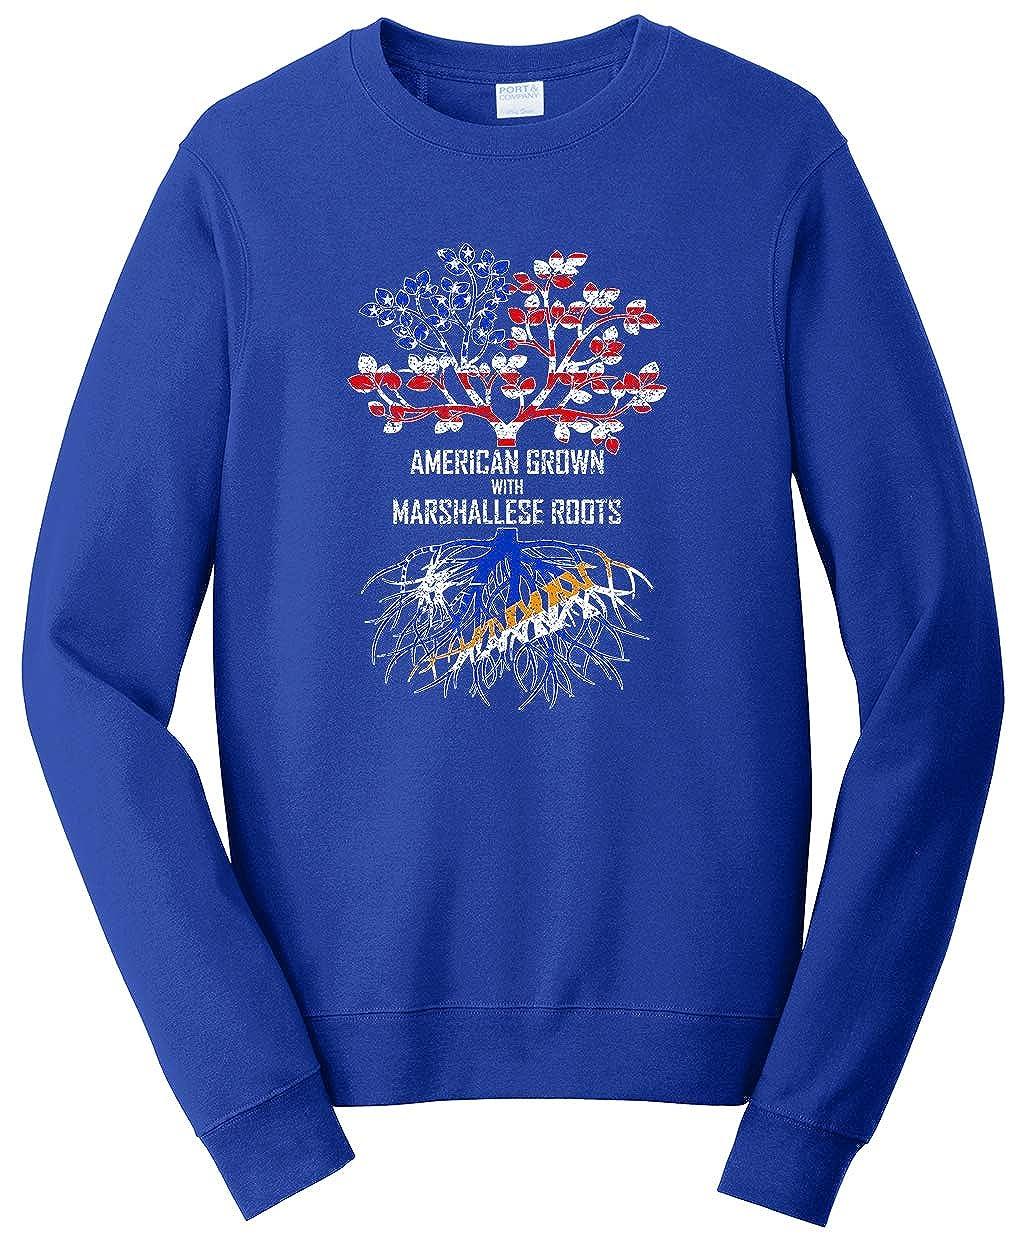 Tenacitee Unisex American Grown with Marshallese Roots Sweatshirt